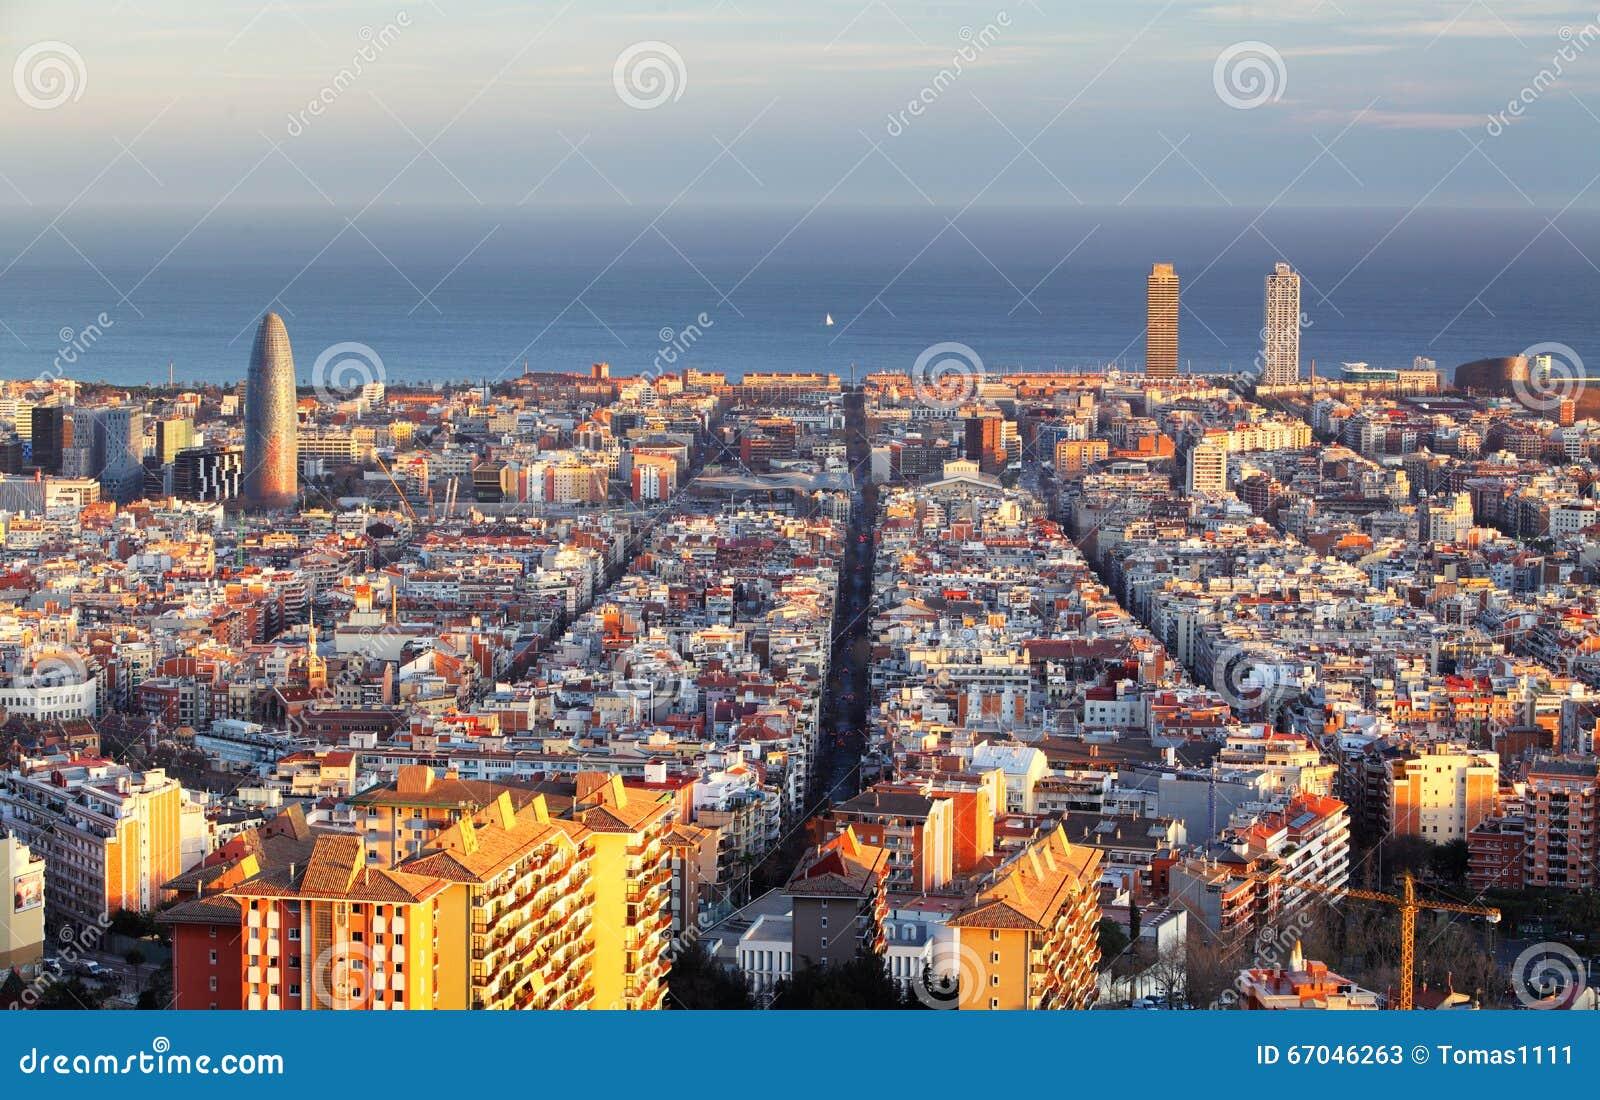 Arquitectura da cidade de Barcelona, Spain